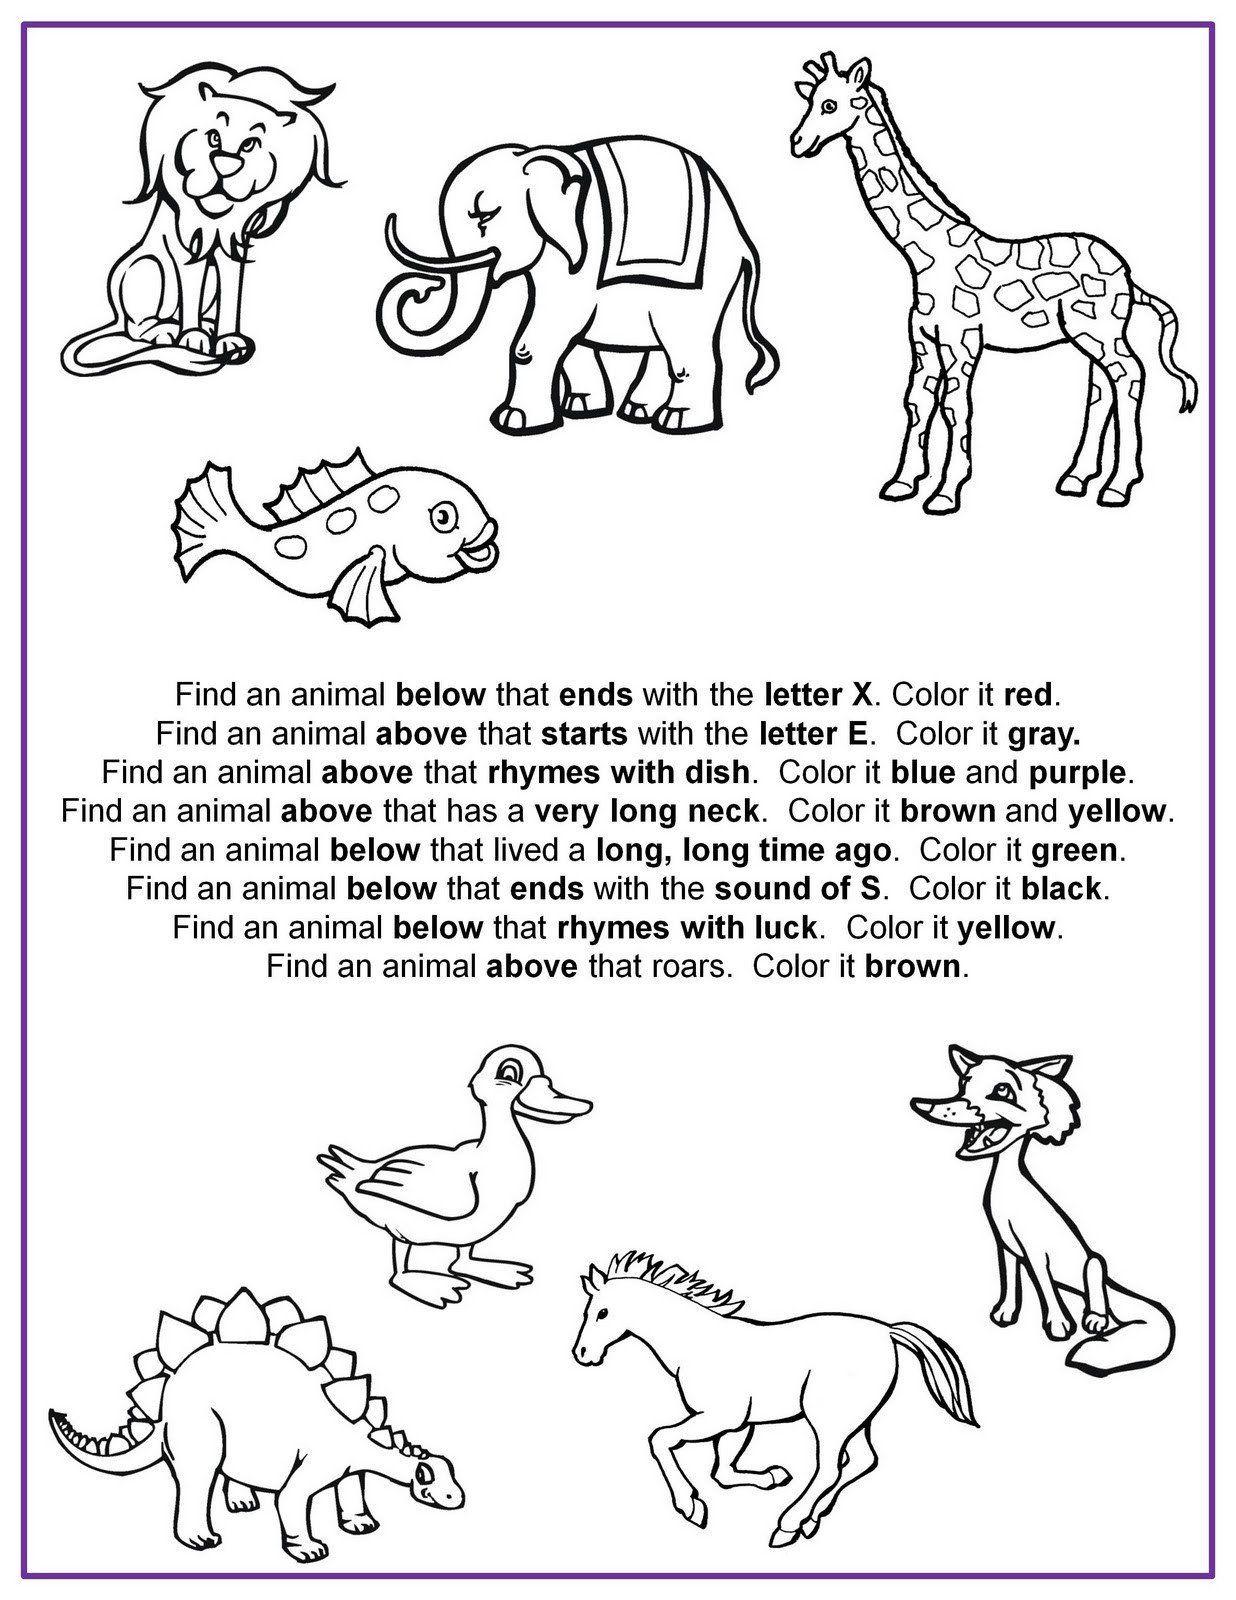 Following Directions Worksheet Kindergarten 20 Following Directions Coloring Worksheet In 2020